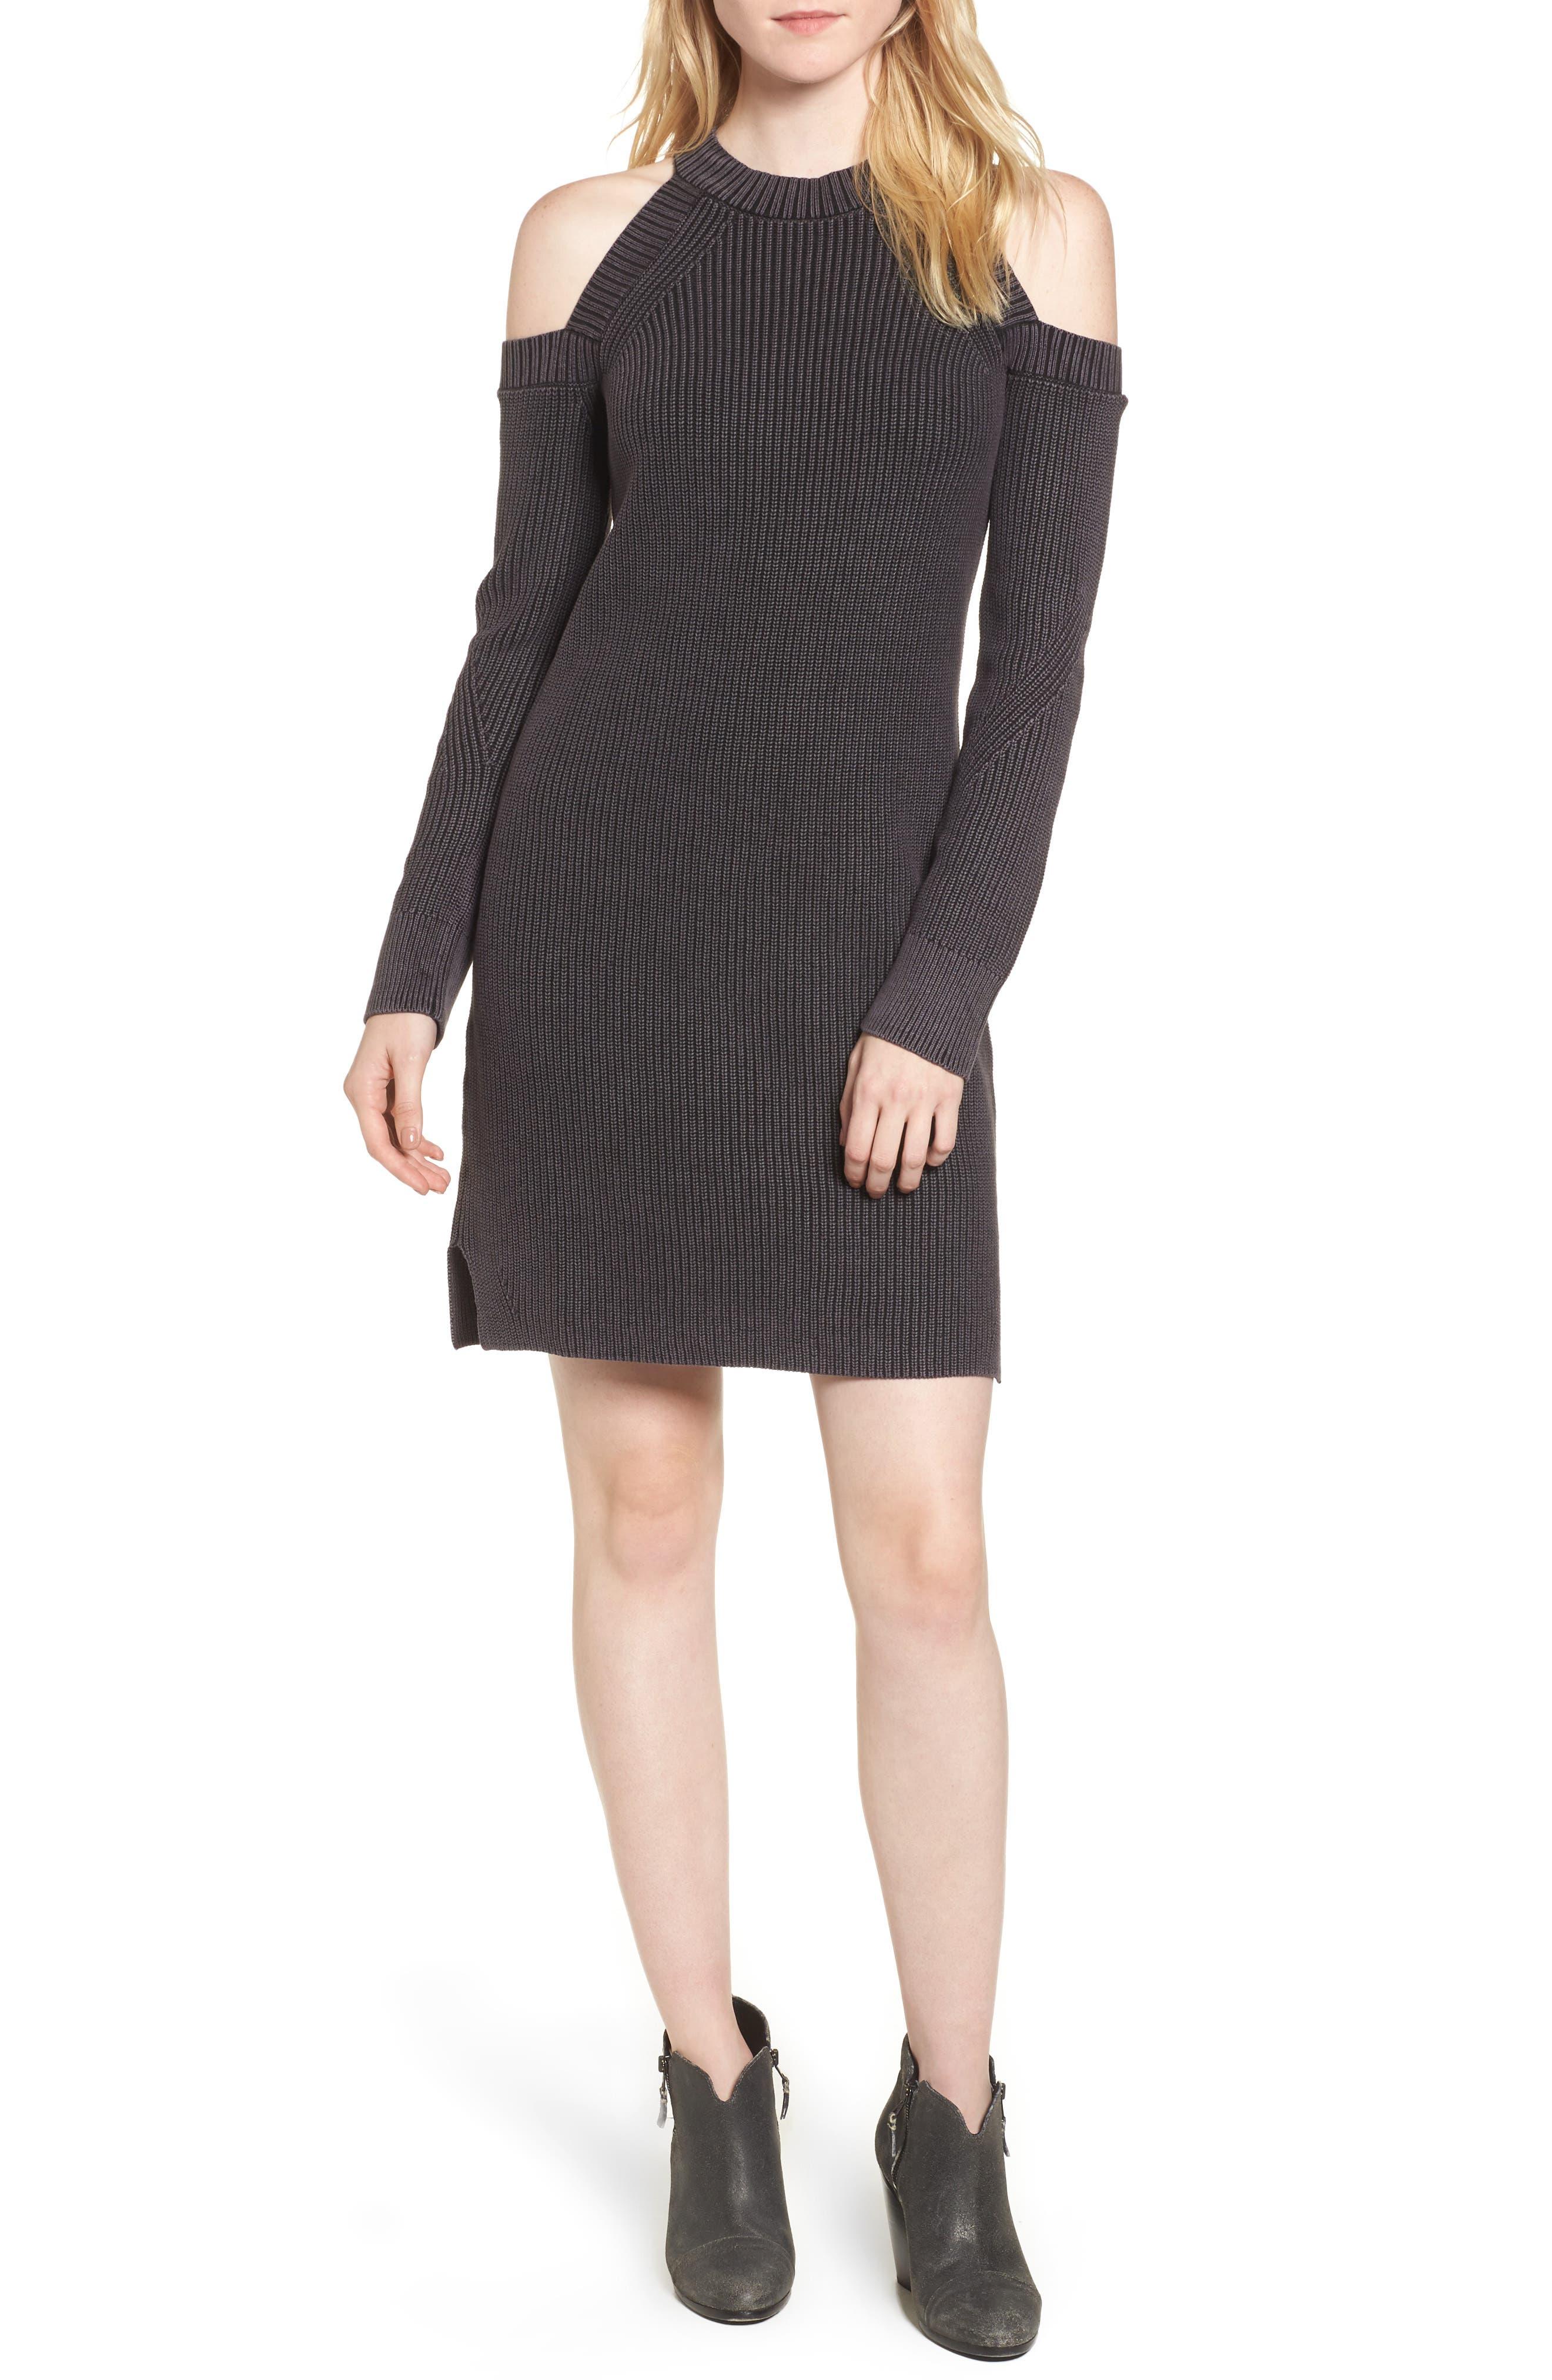 Alternate Image 1 Selected - rag & bone/JEAN Dana Cold Shoulder Sweater Dress